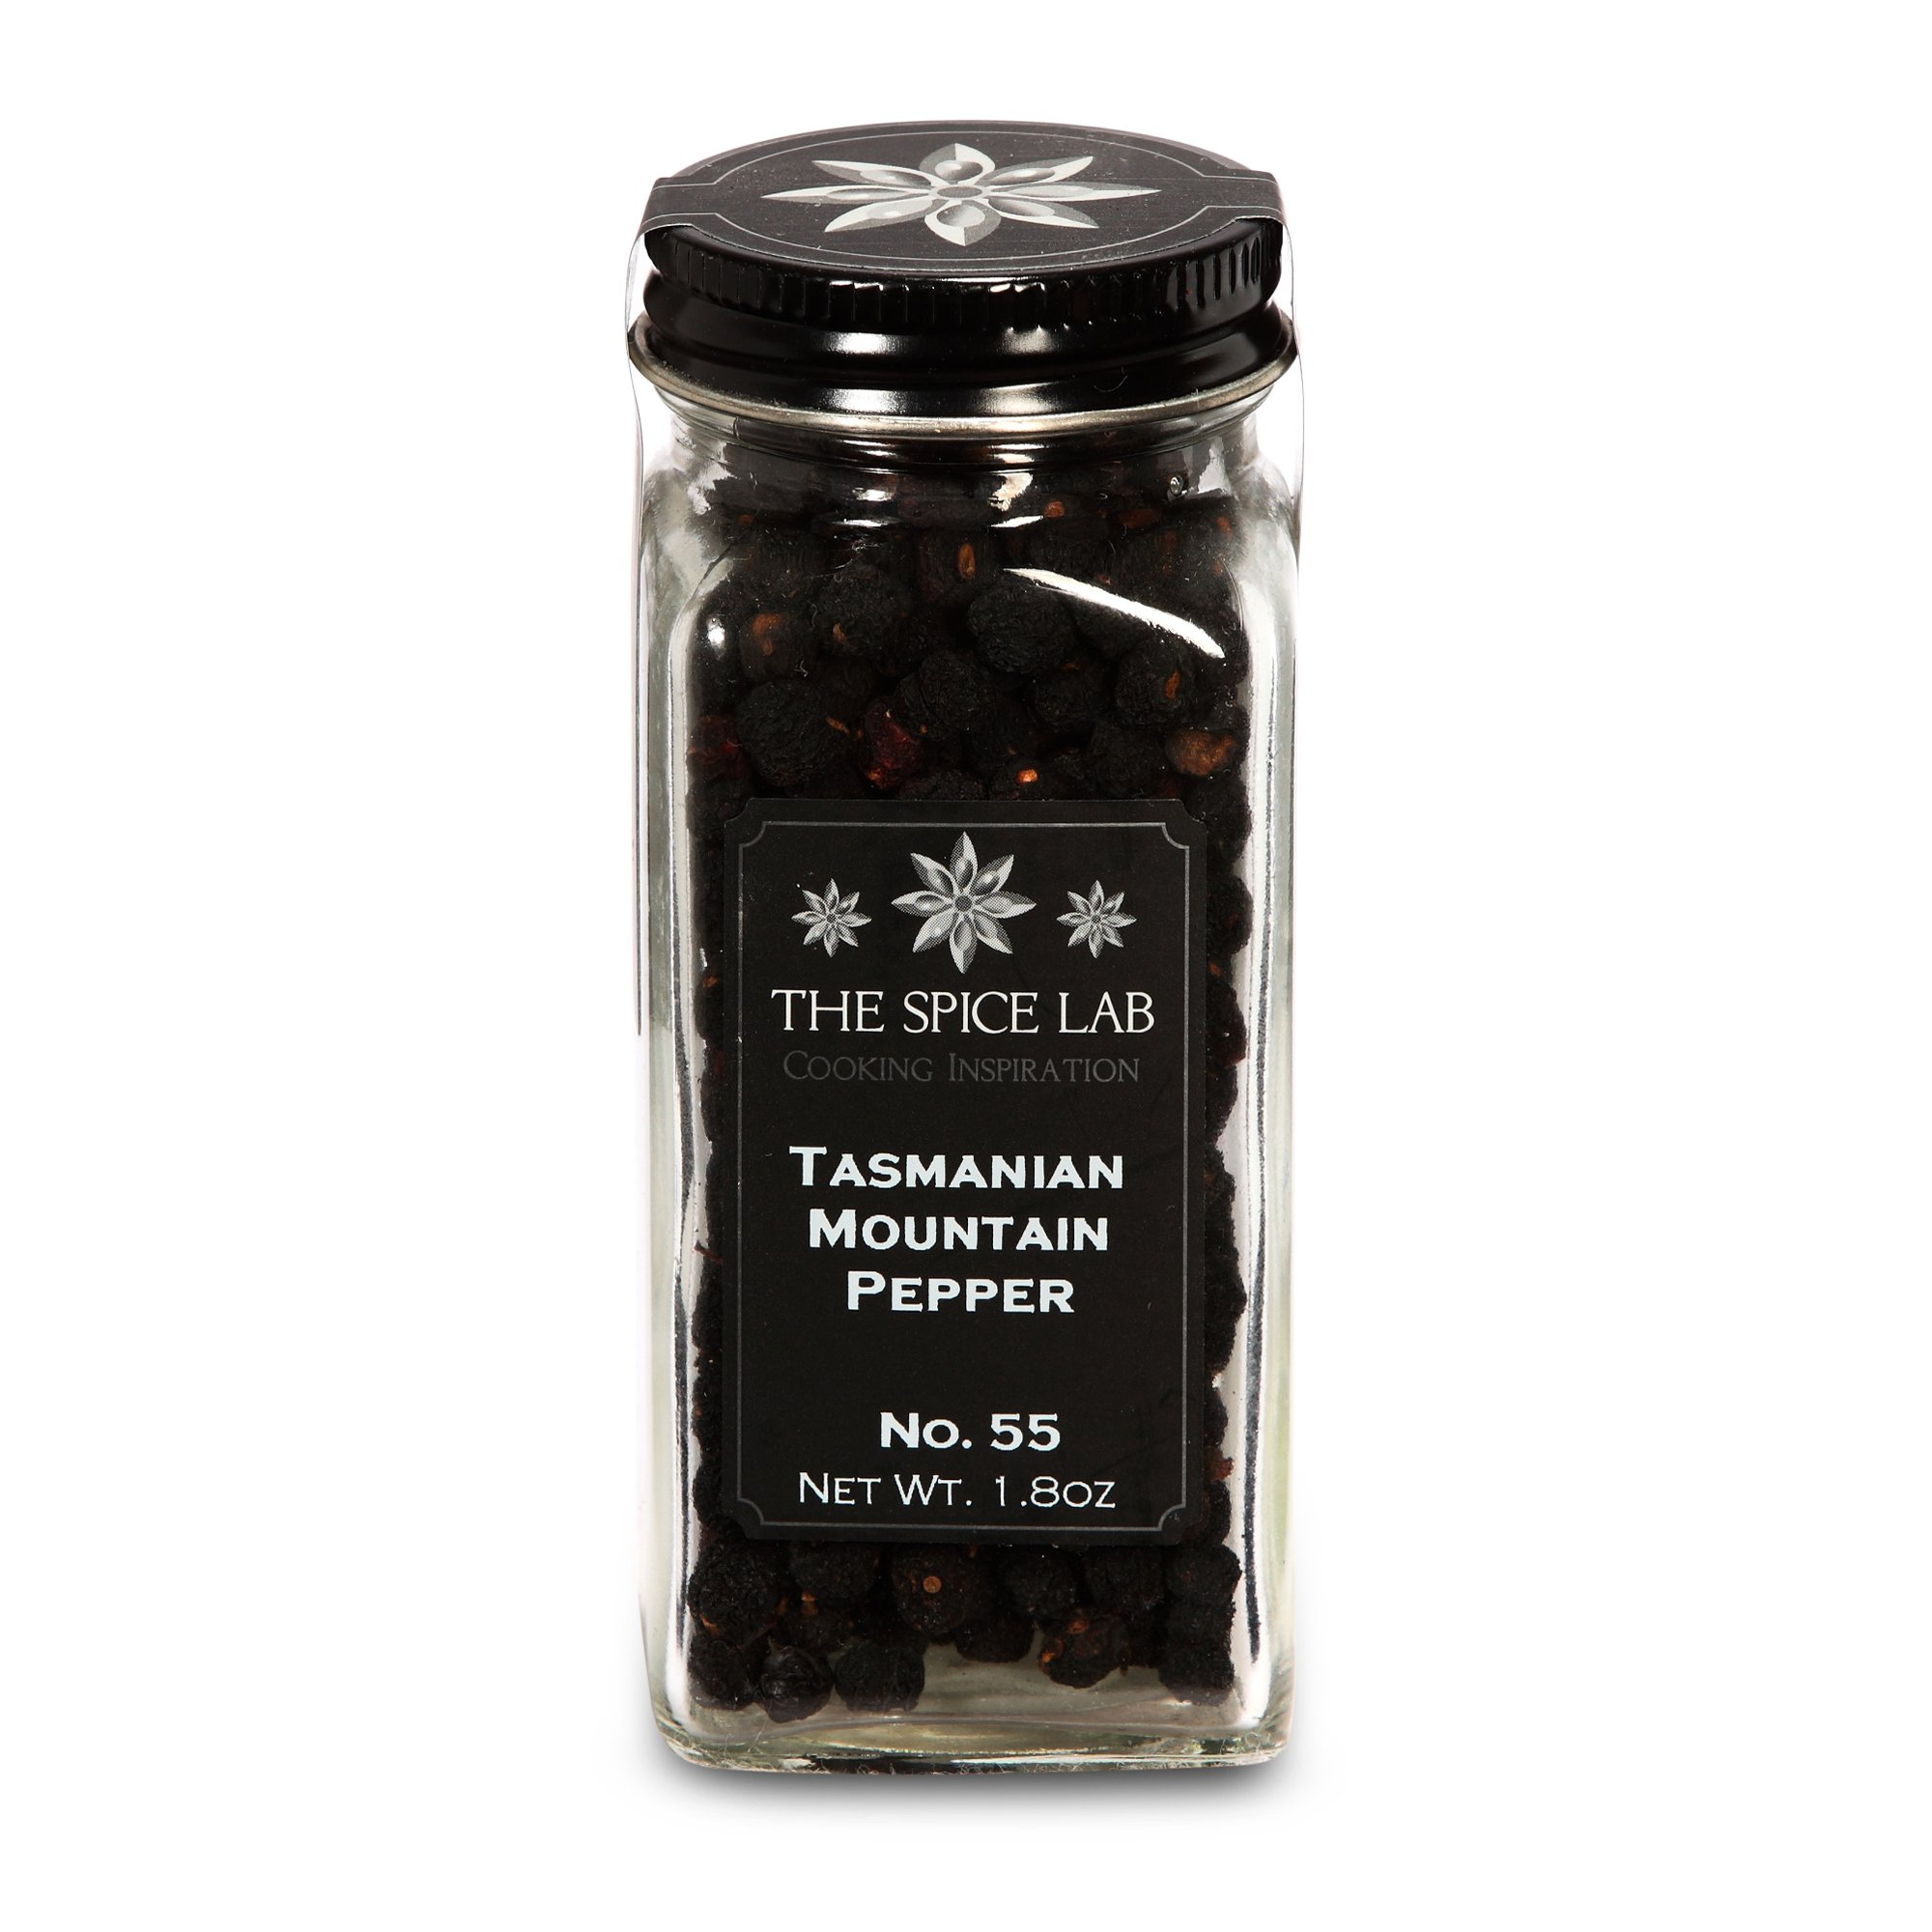 The Spice Lab No. 55 - Tasmanian Mountain Pepper - All Natural Kosher Non GMO Gluten Free Pepper - French Jar